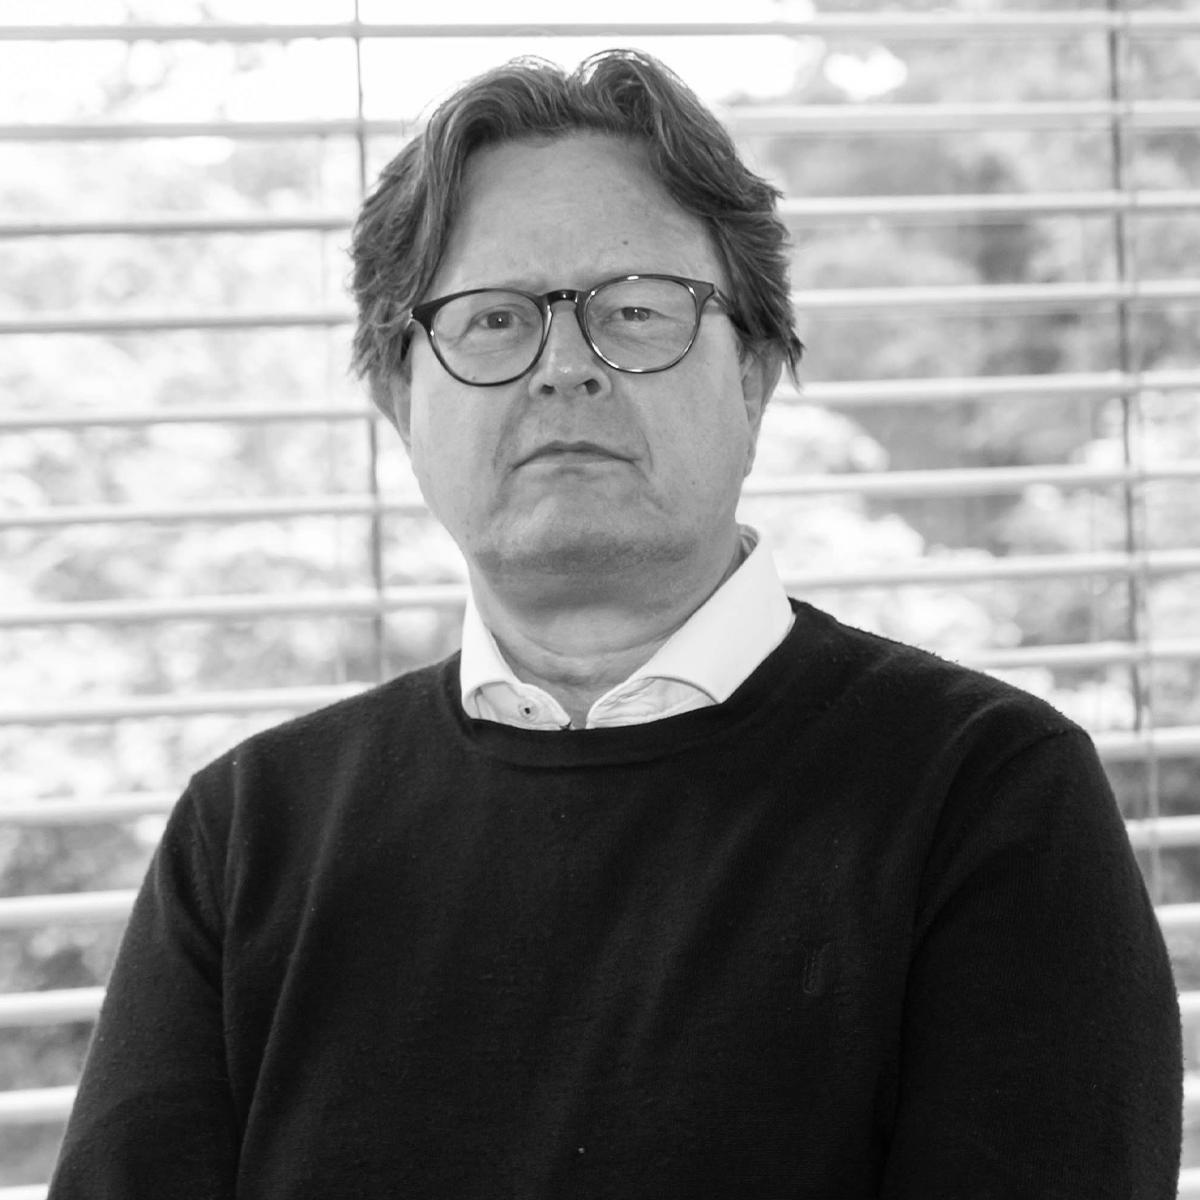 Michael Lindquist